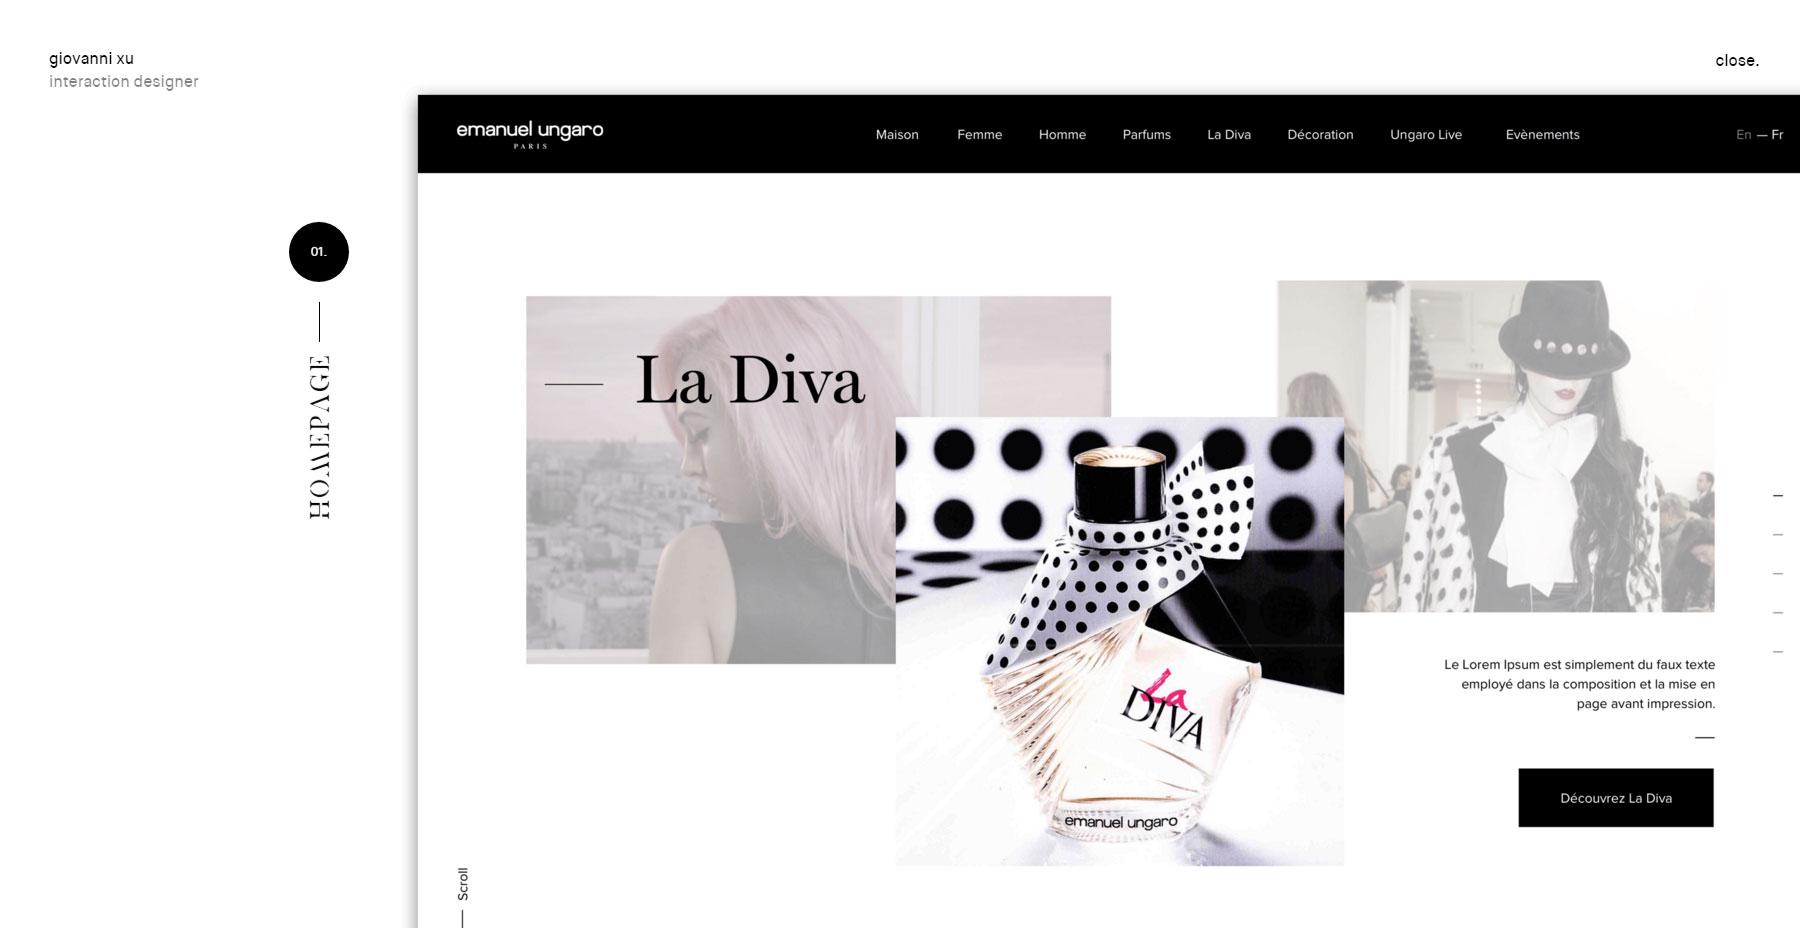 Giovanni Xu - Portfolio 2016 - Website of the Day